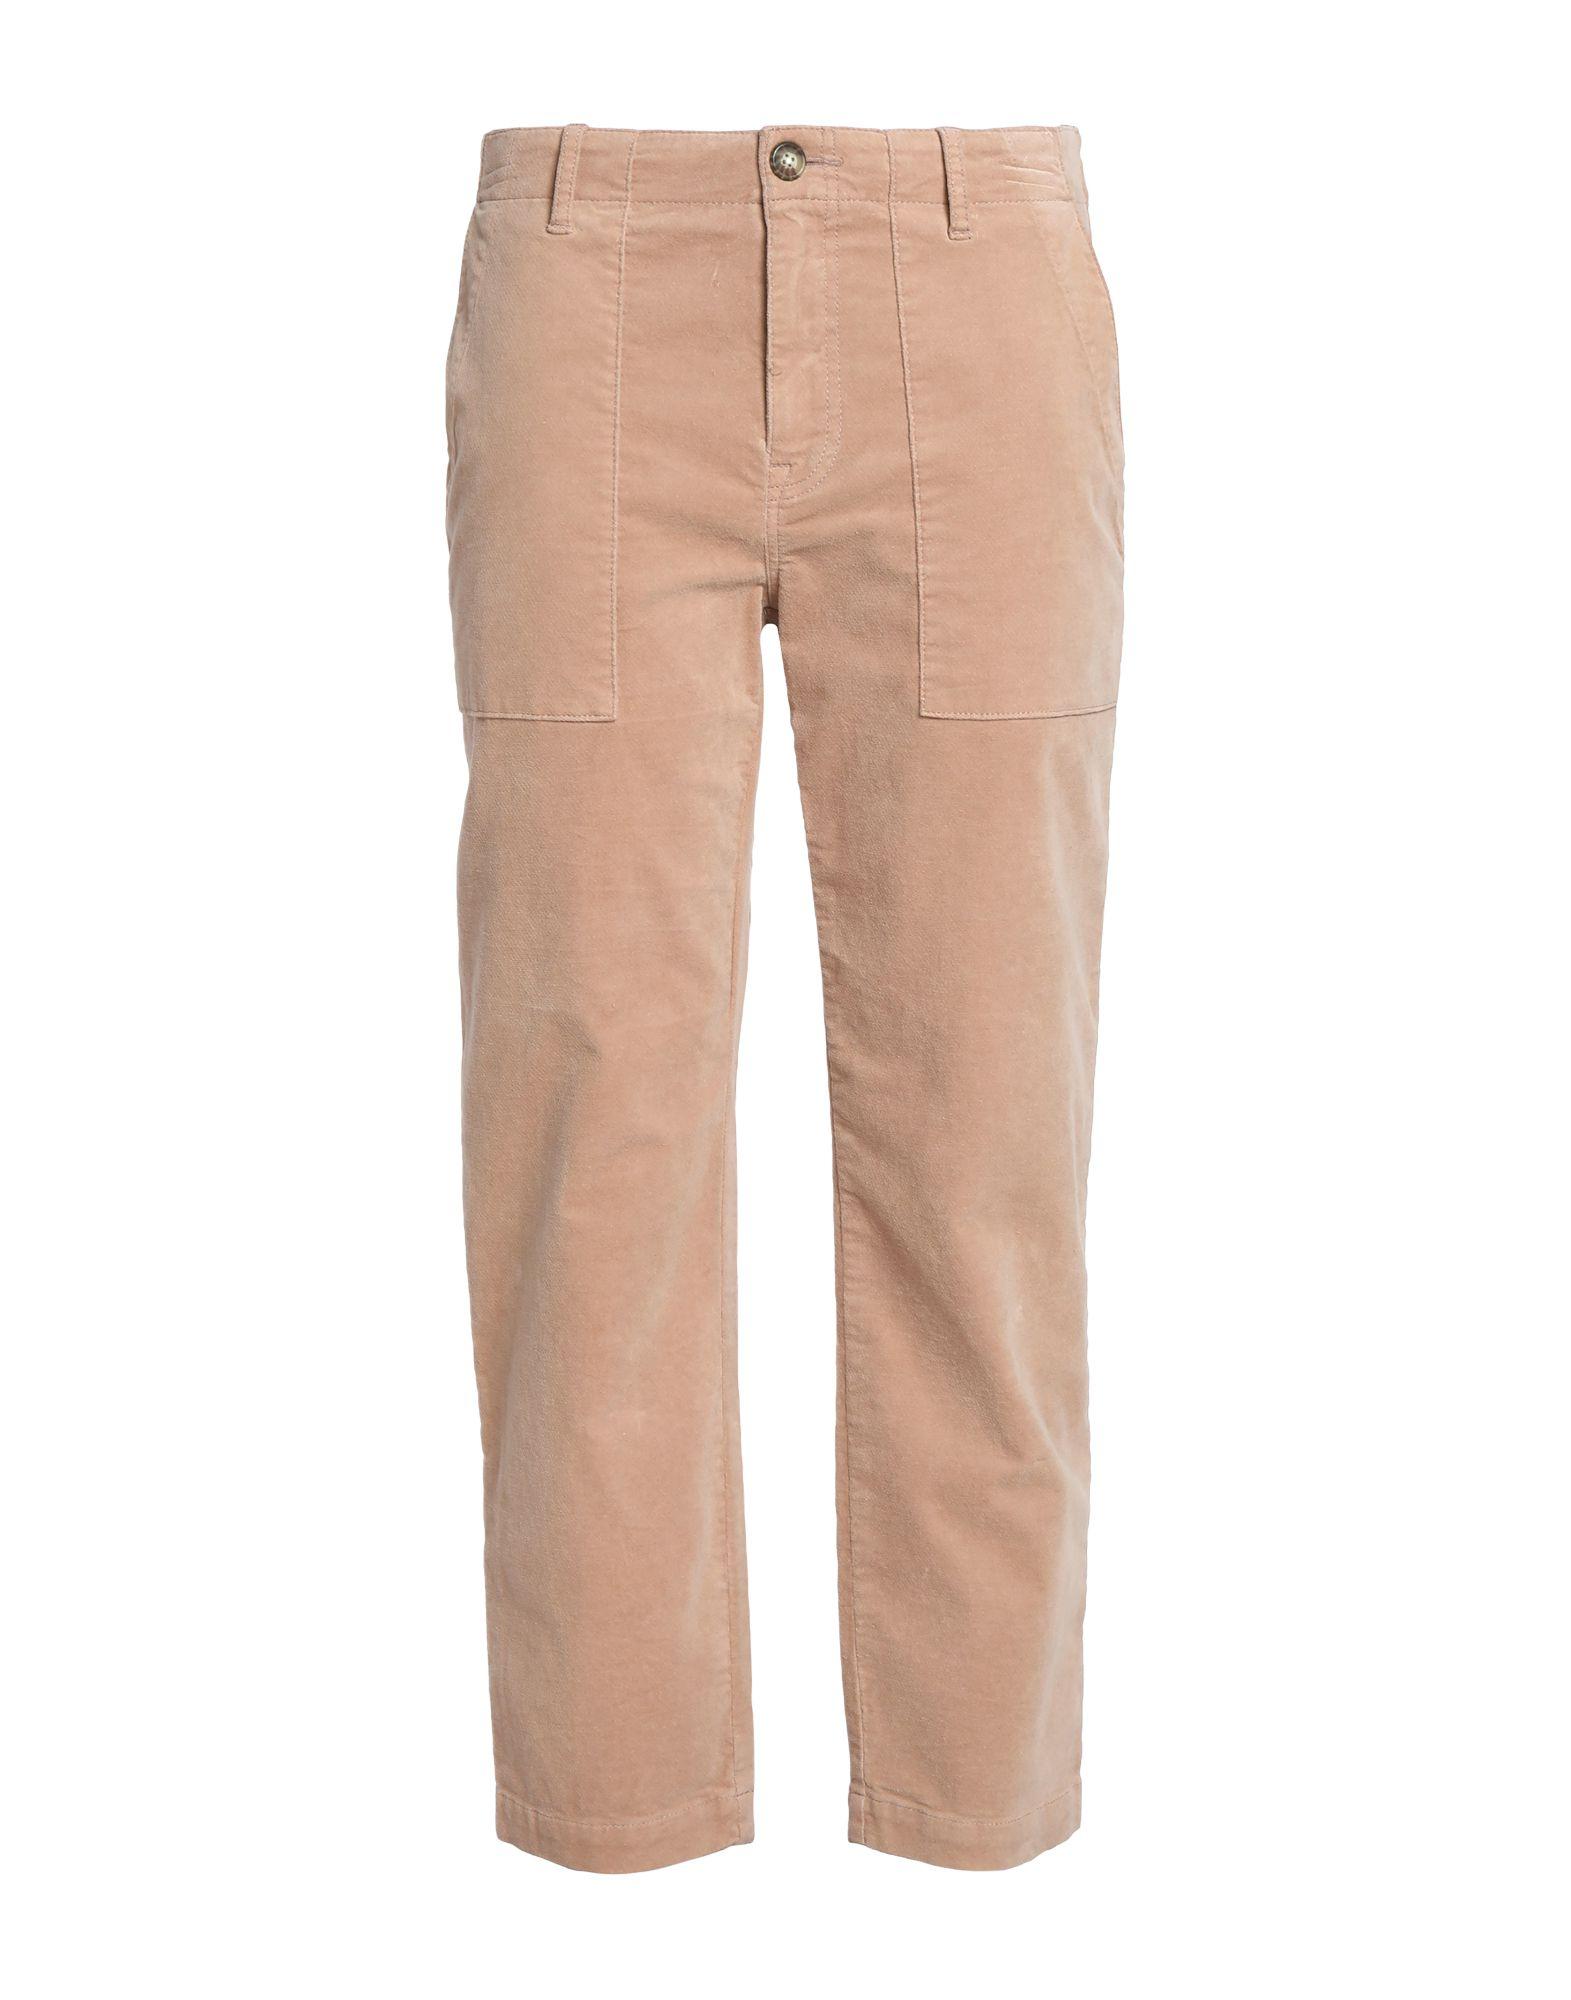 Фото - JOIE Повседневные брюки joie брюки капри